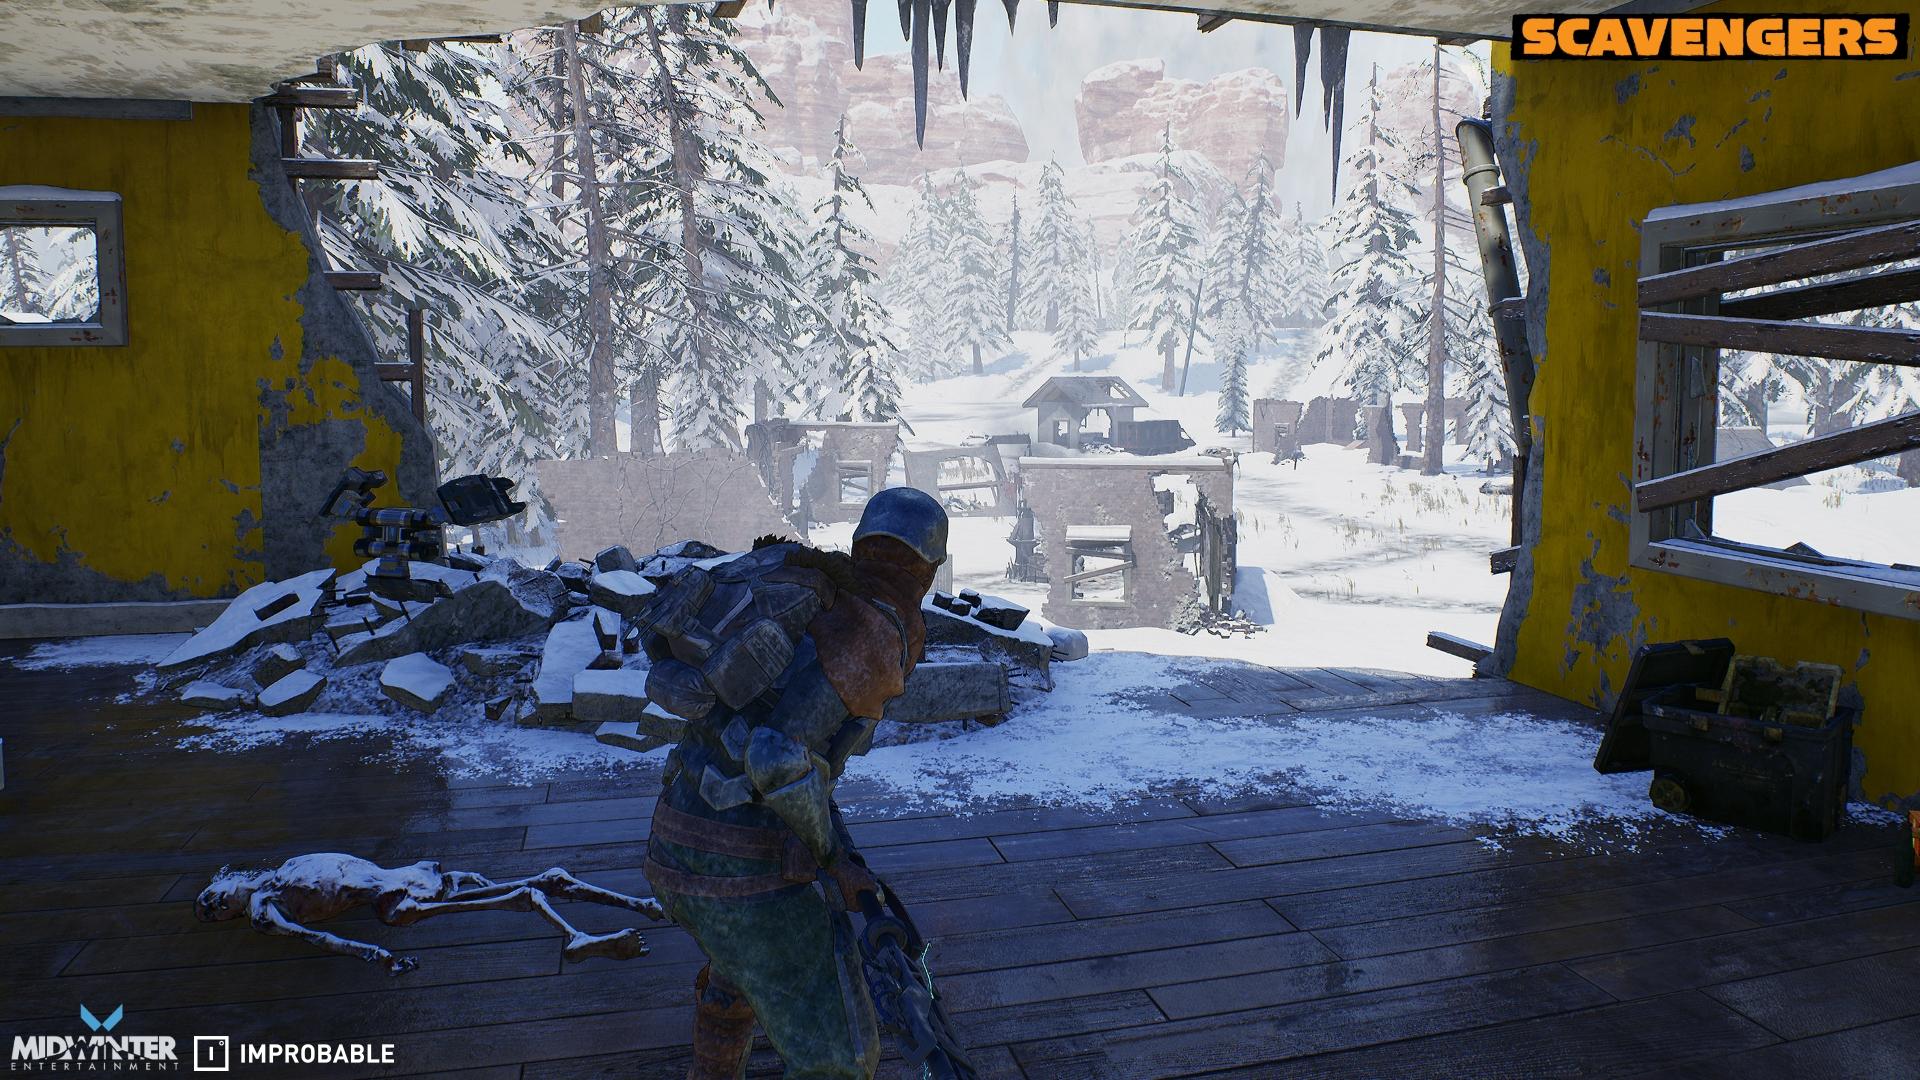 Scavengers E3 2019 screenshot 1